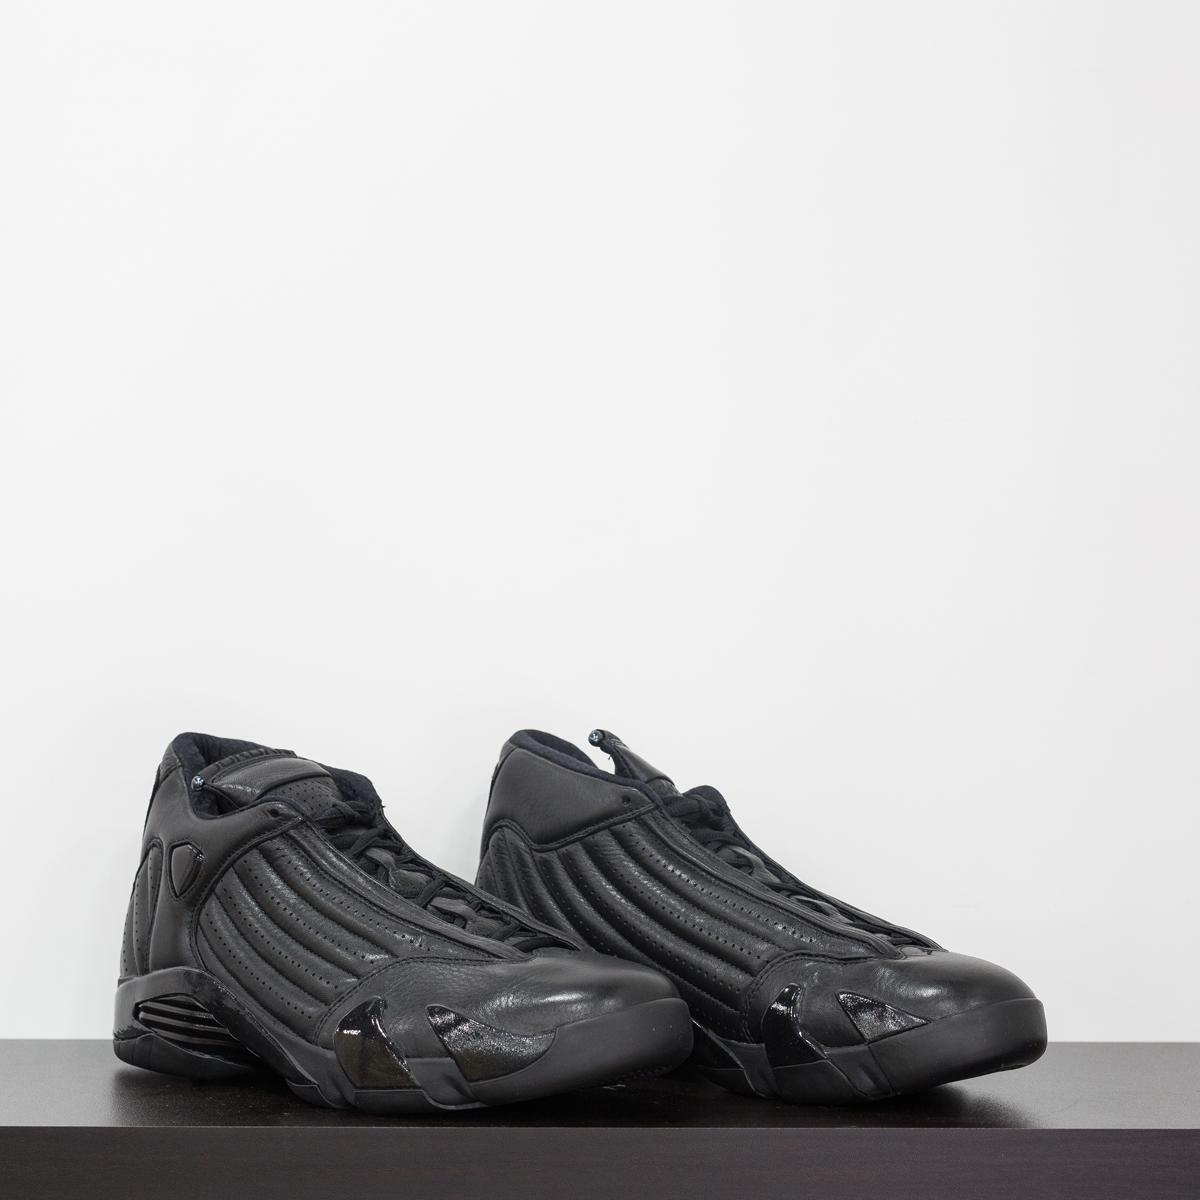 Ebay Nike Air Max Running Shoes